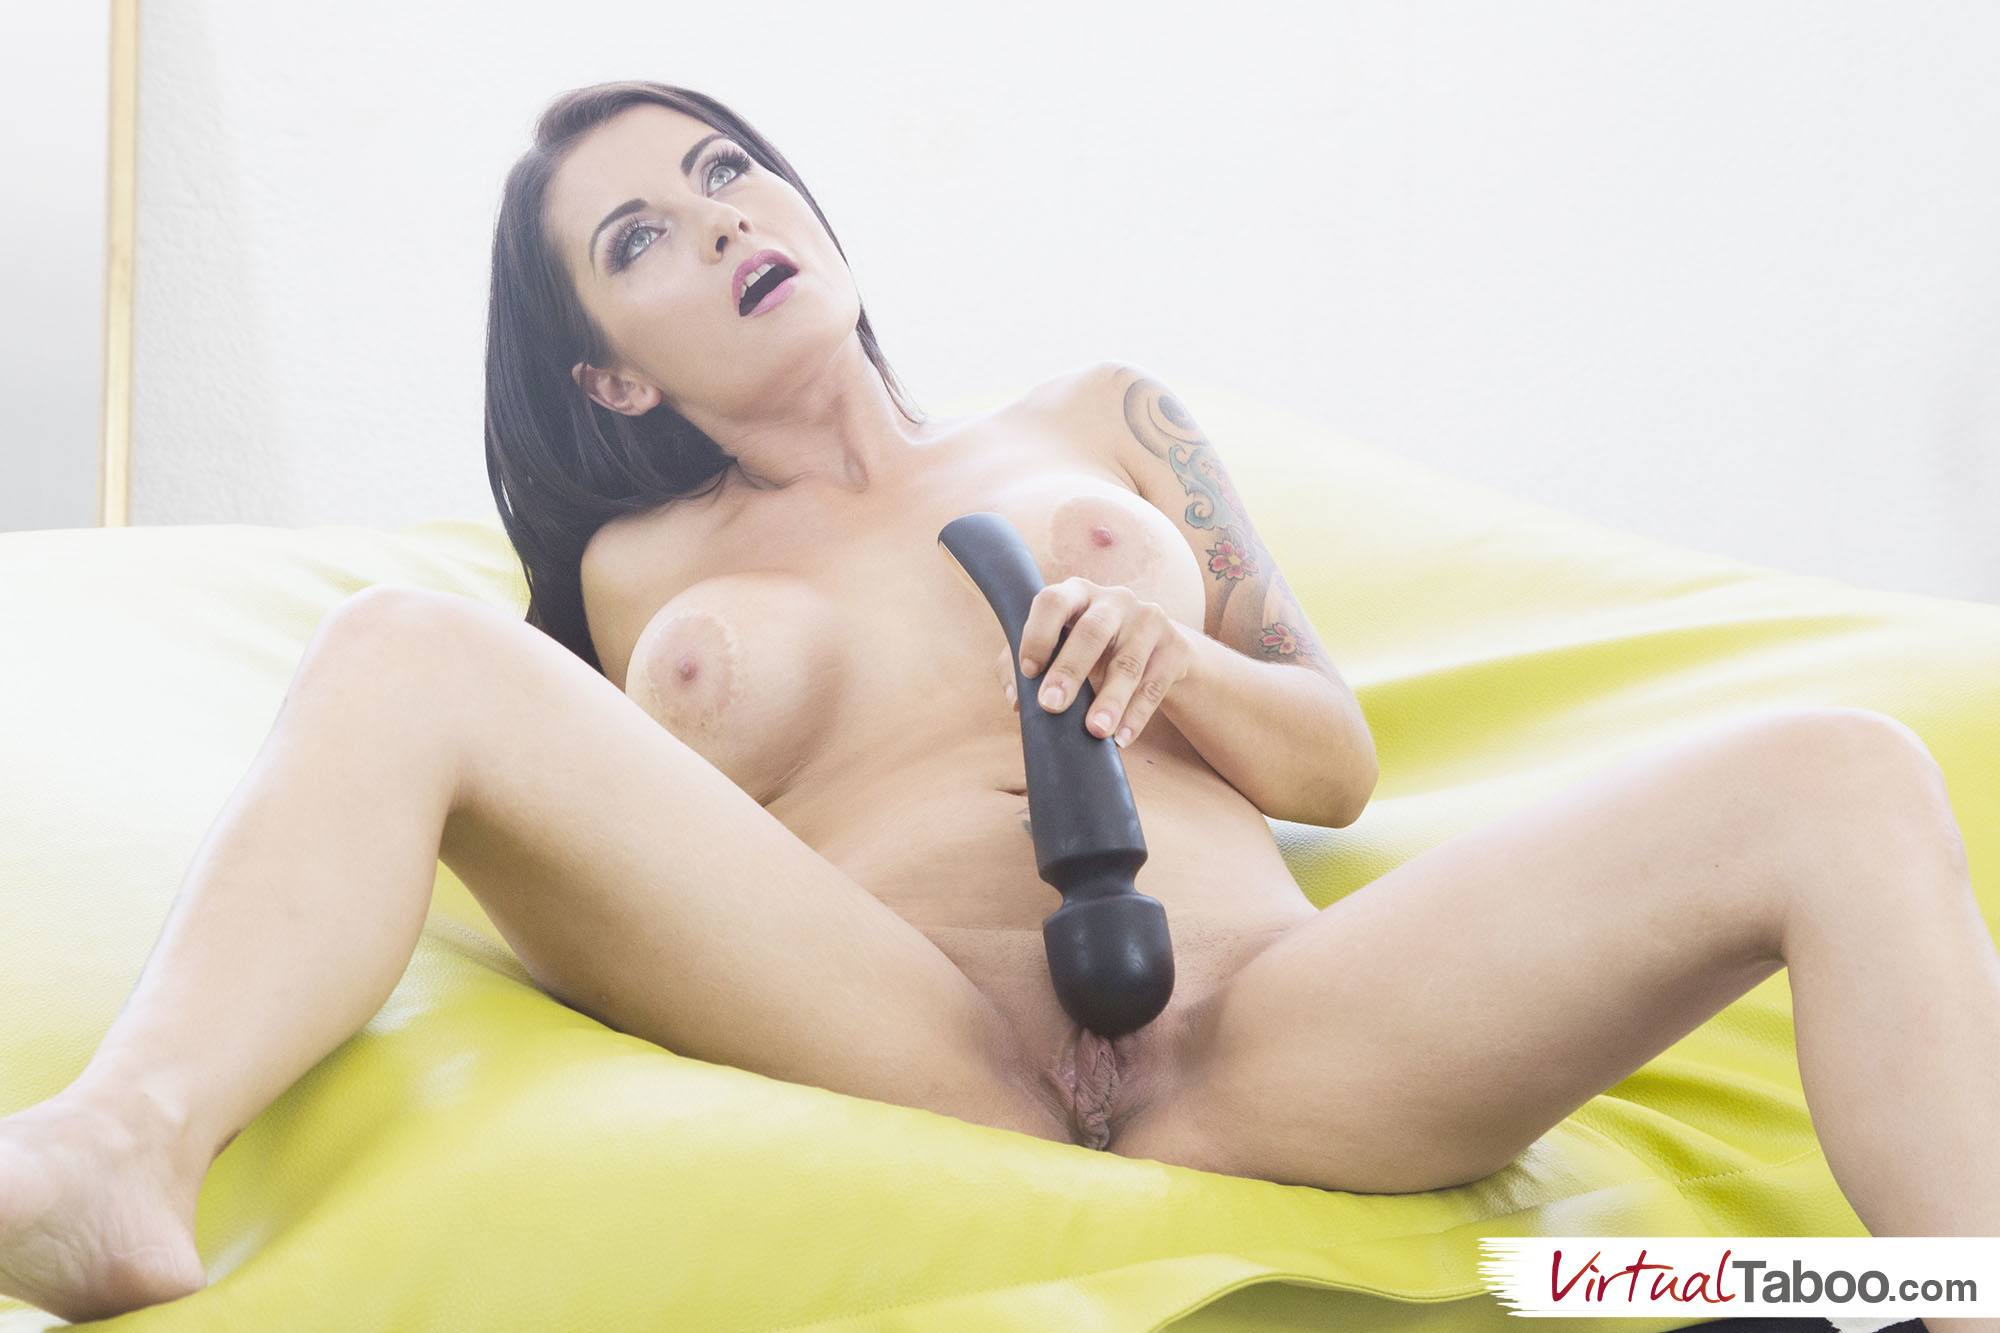 bianka porn videos